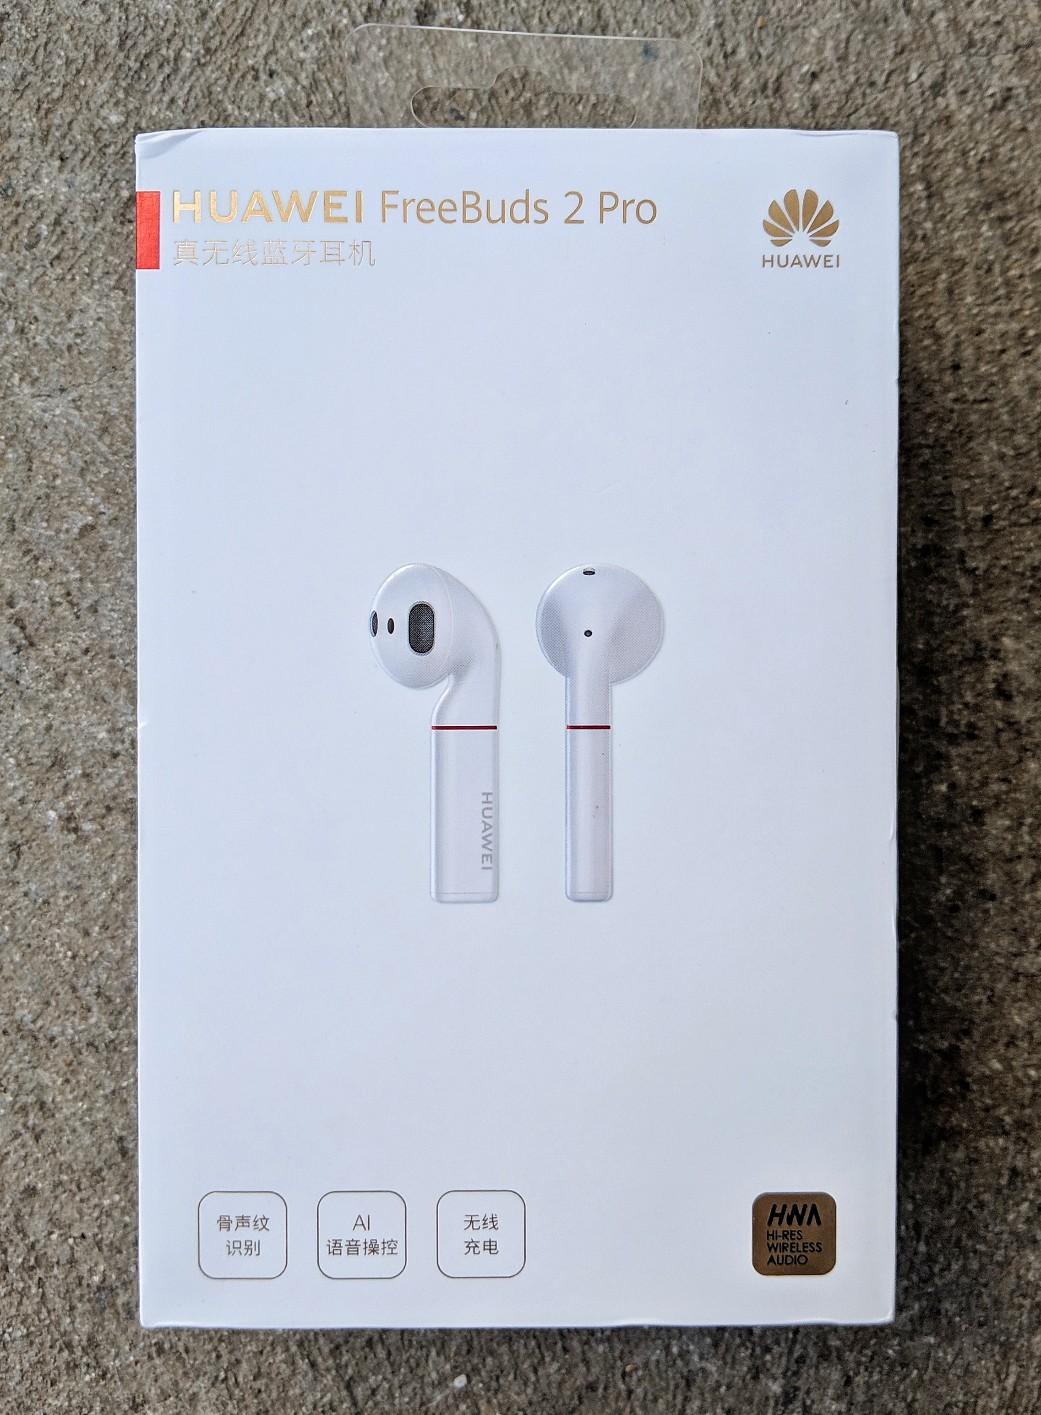 Huawei-Freebuds-Pro-2